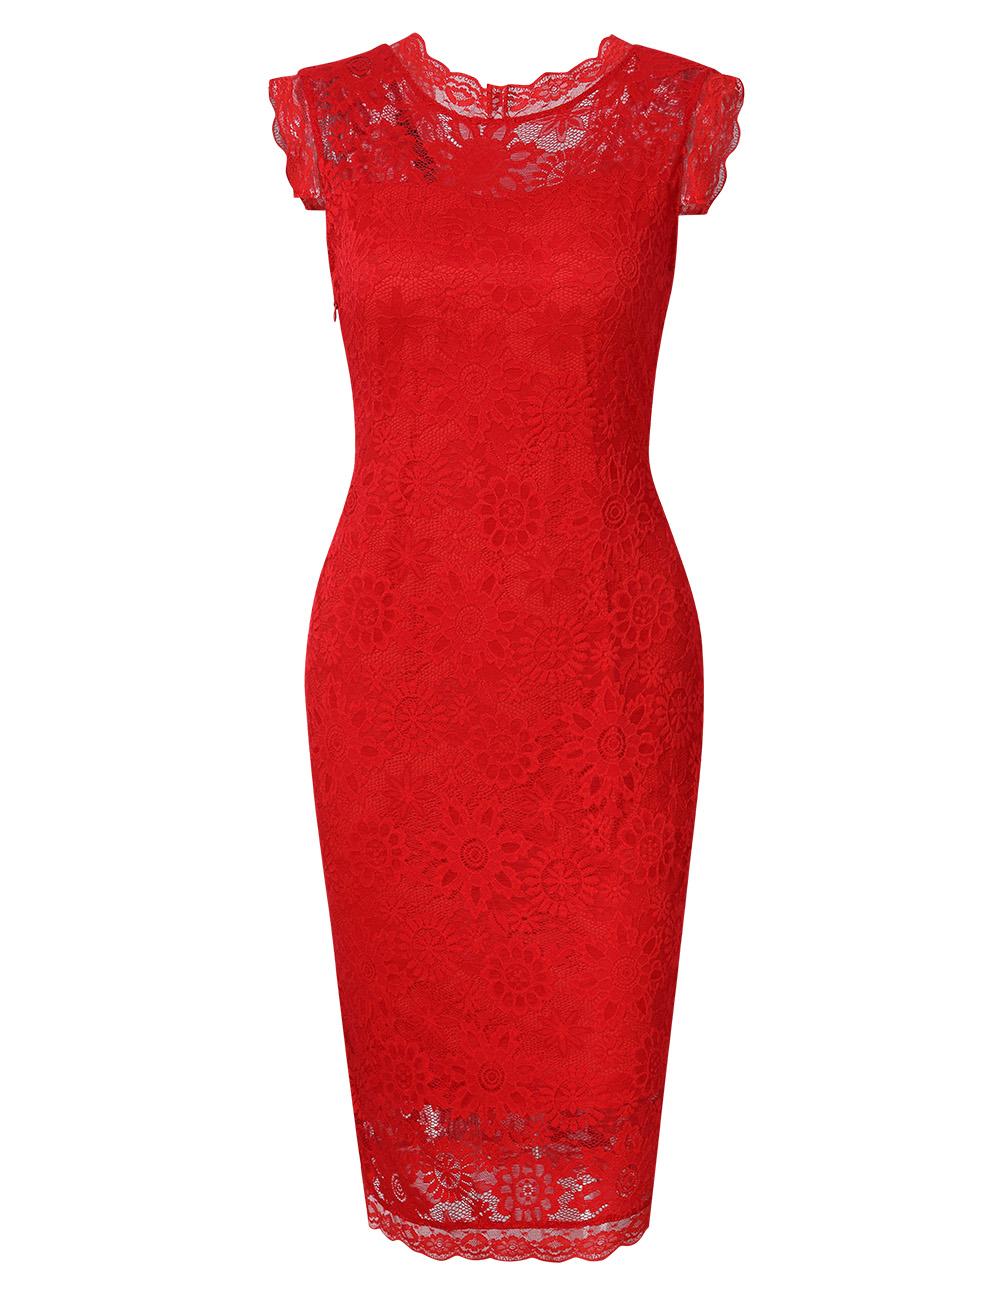 HIQUEEN Women's Slim Sleeveless Elegant Floral Lace Cocktail Evening Dress Black XXL